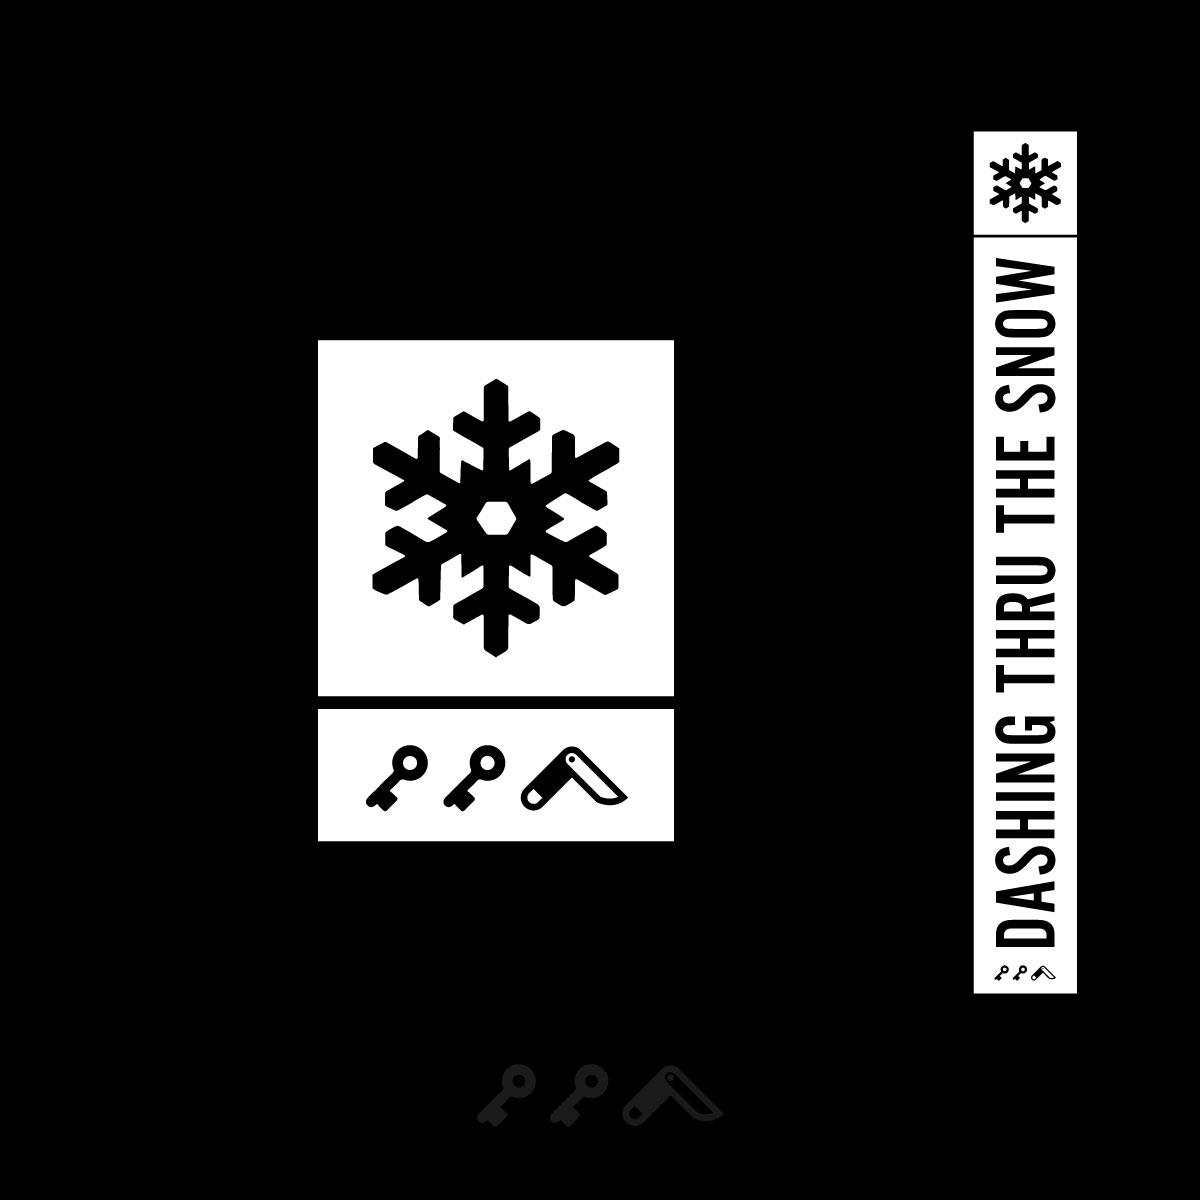 dashing thru the snow sweatshirt design